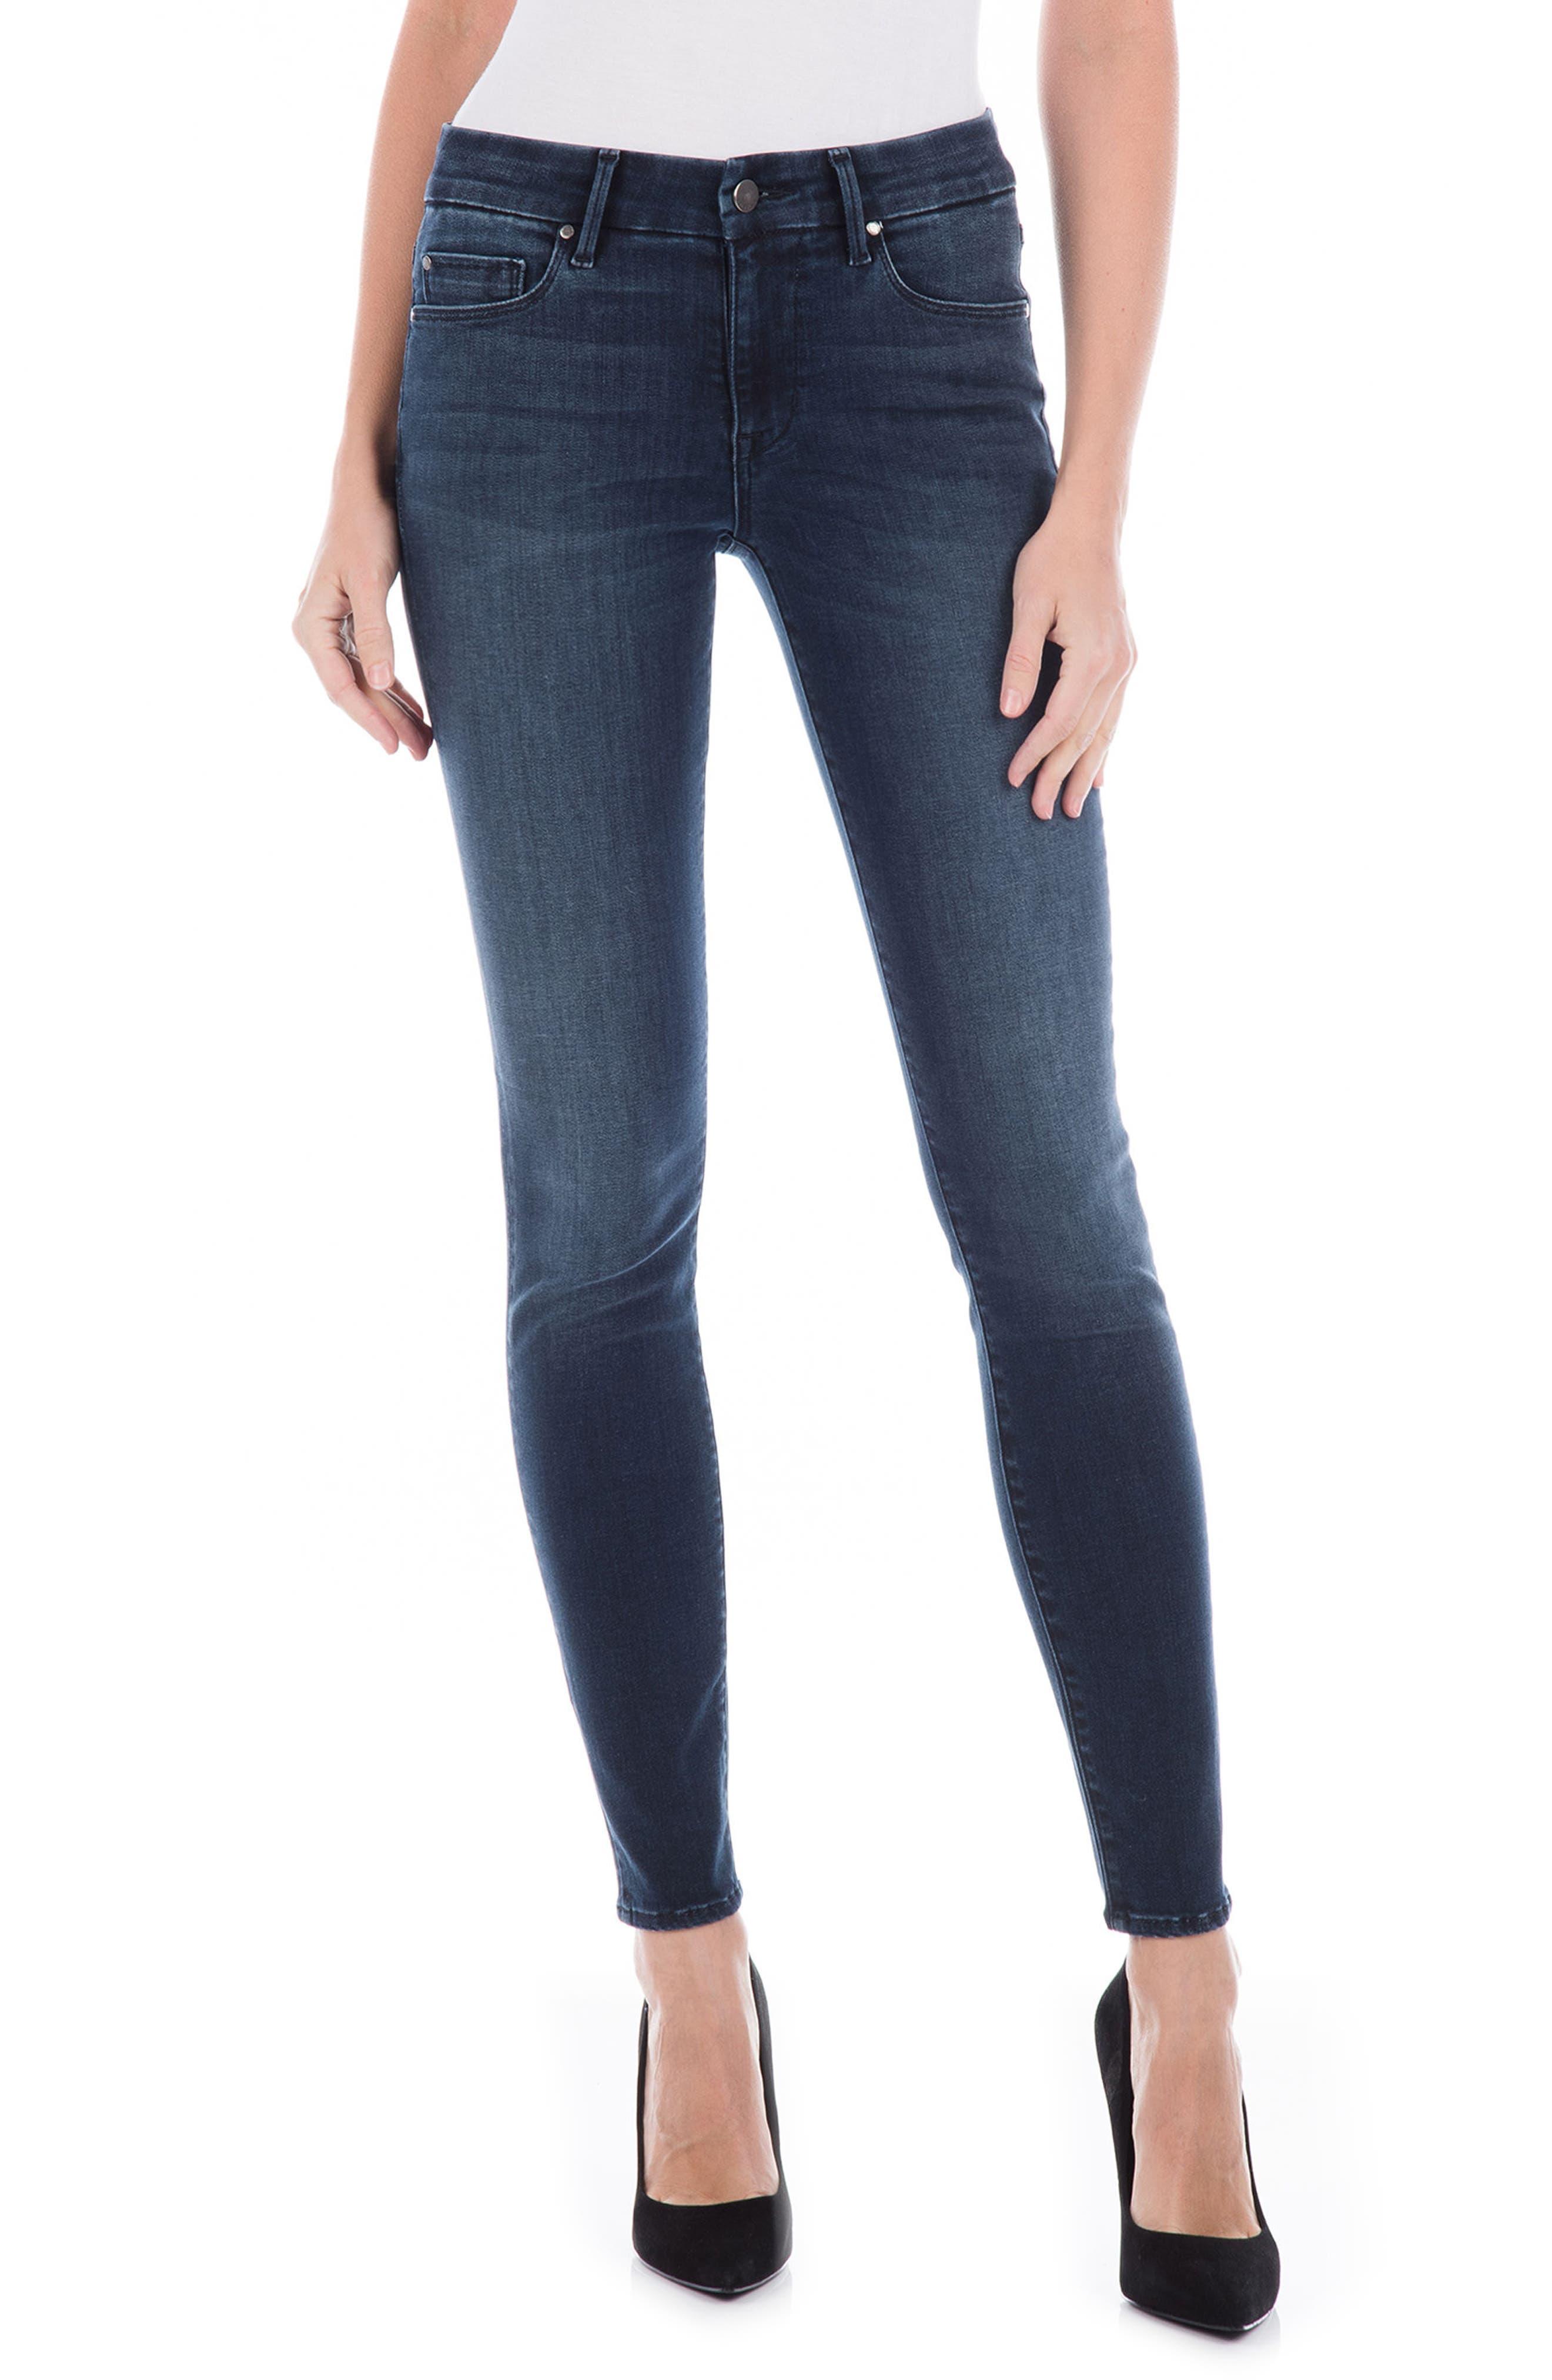 Sola Skinny Jeans,                             Main thumbnail 1, color,                             400